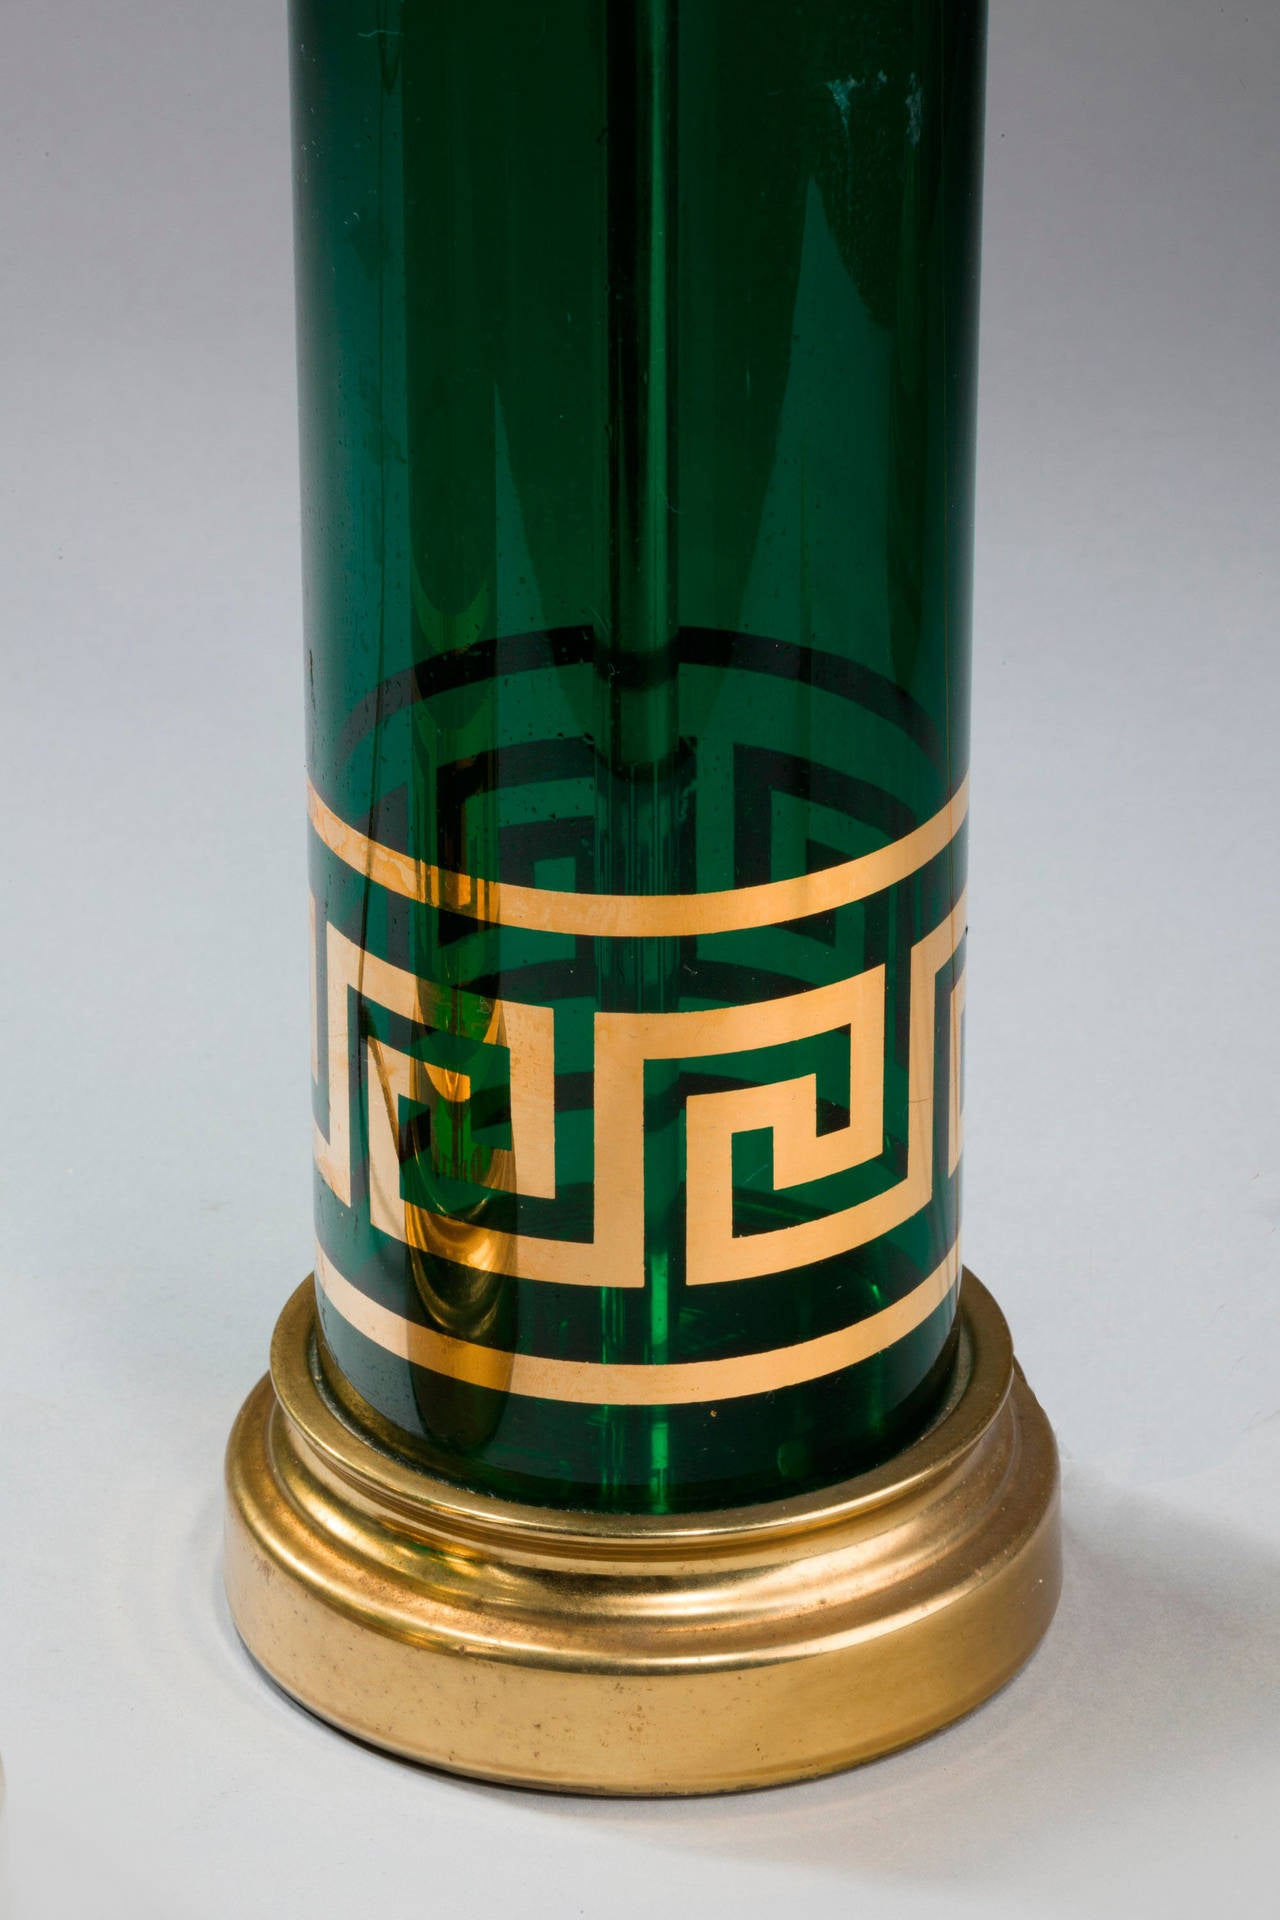 European Pair of Art Deco Lamps